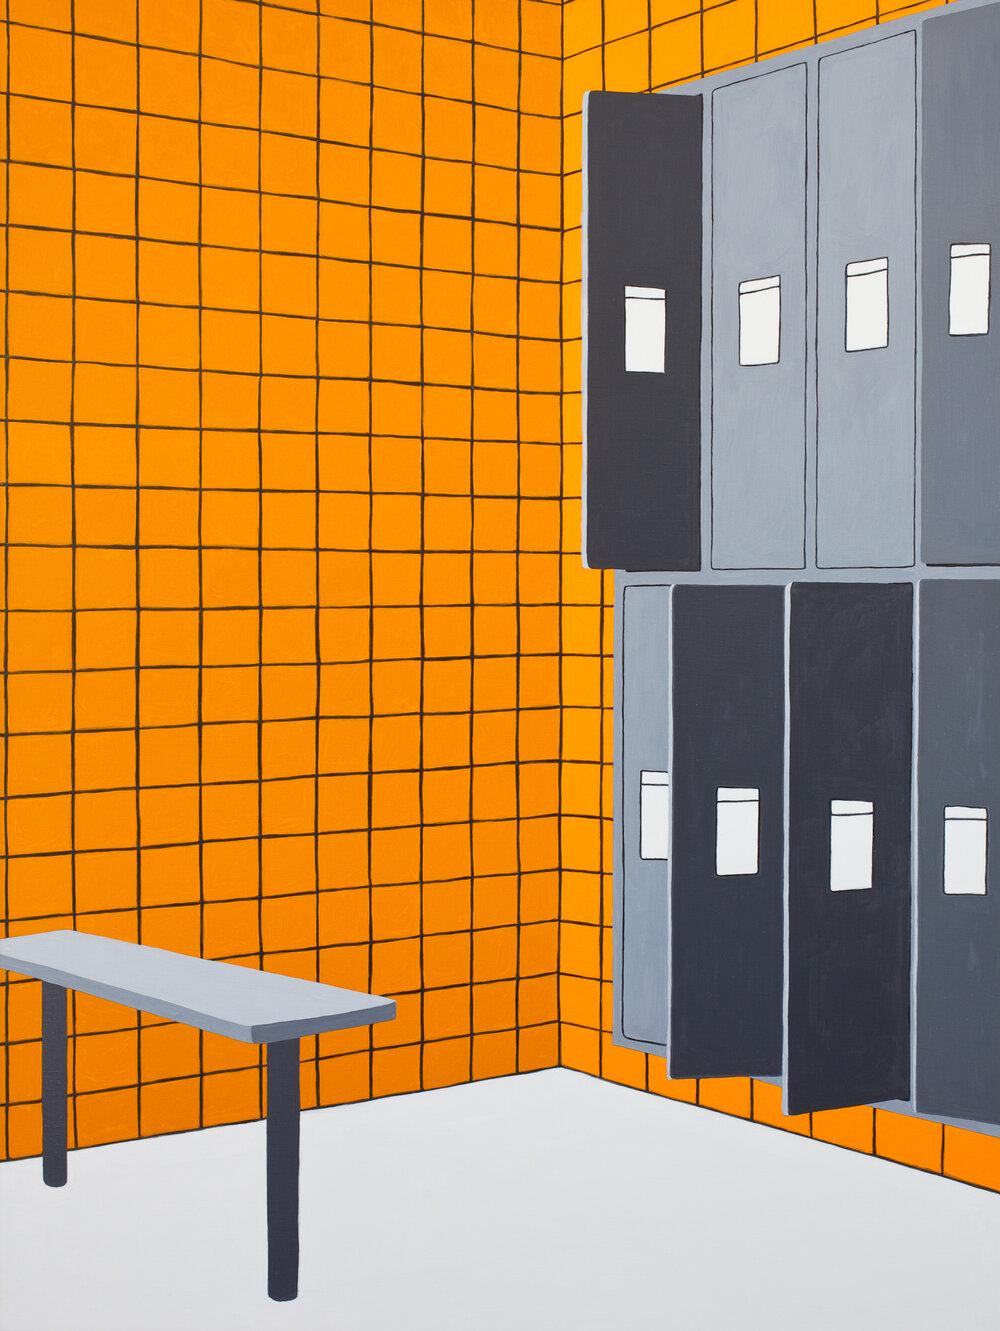 Locker Room #2, 2019, Oil on Linen, 24 X 32 inches